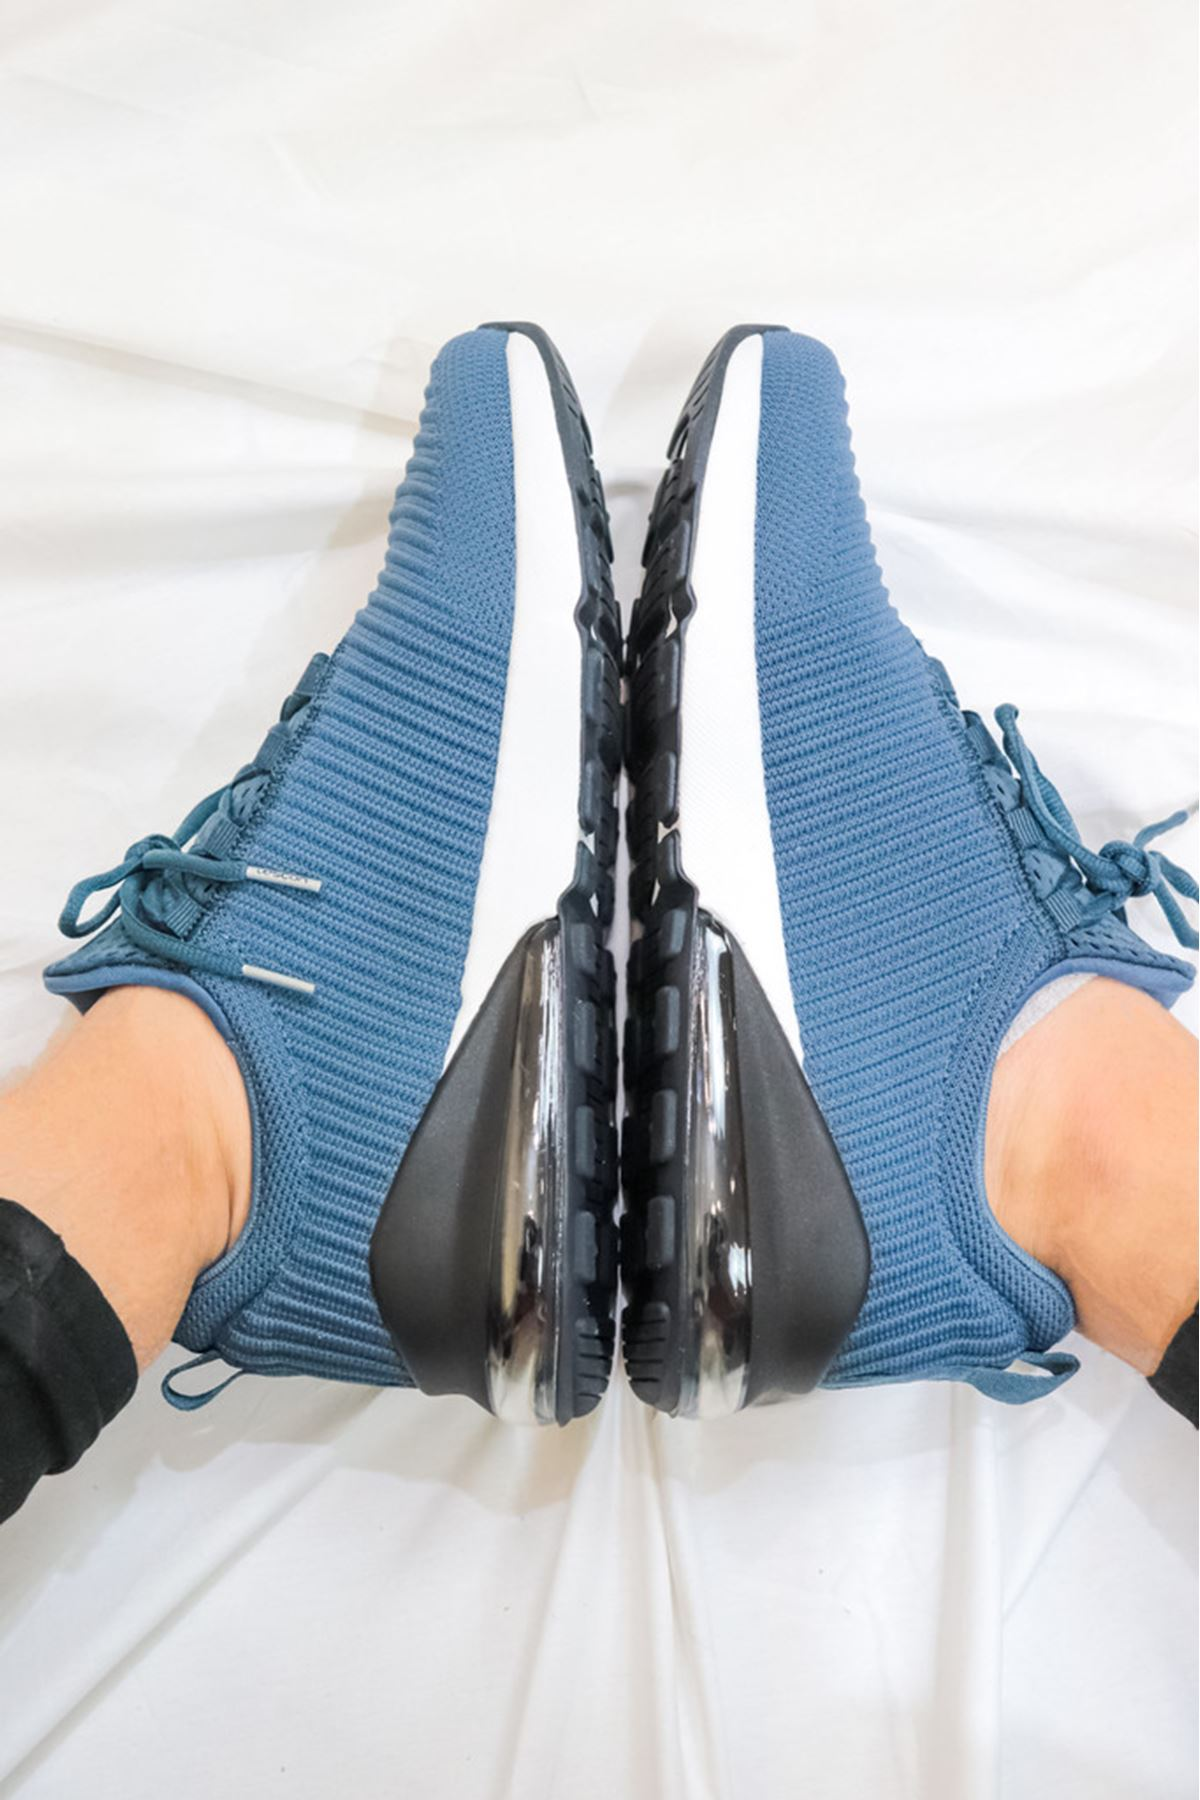 LESCON - Airtube Volt2 Lacivert Erkek Spor Ayakkabısı